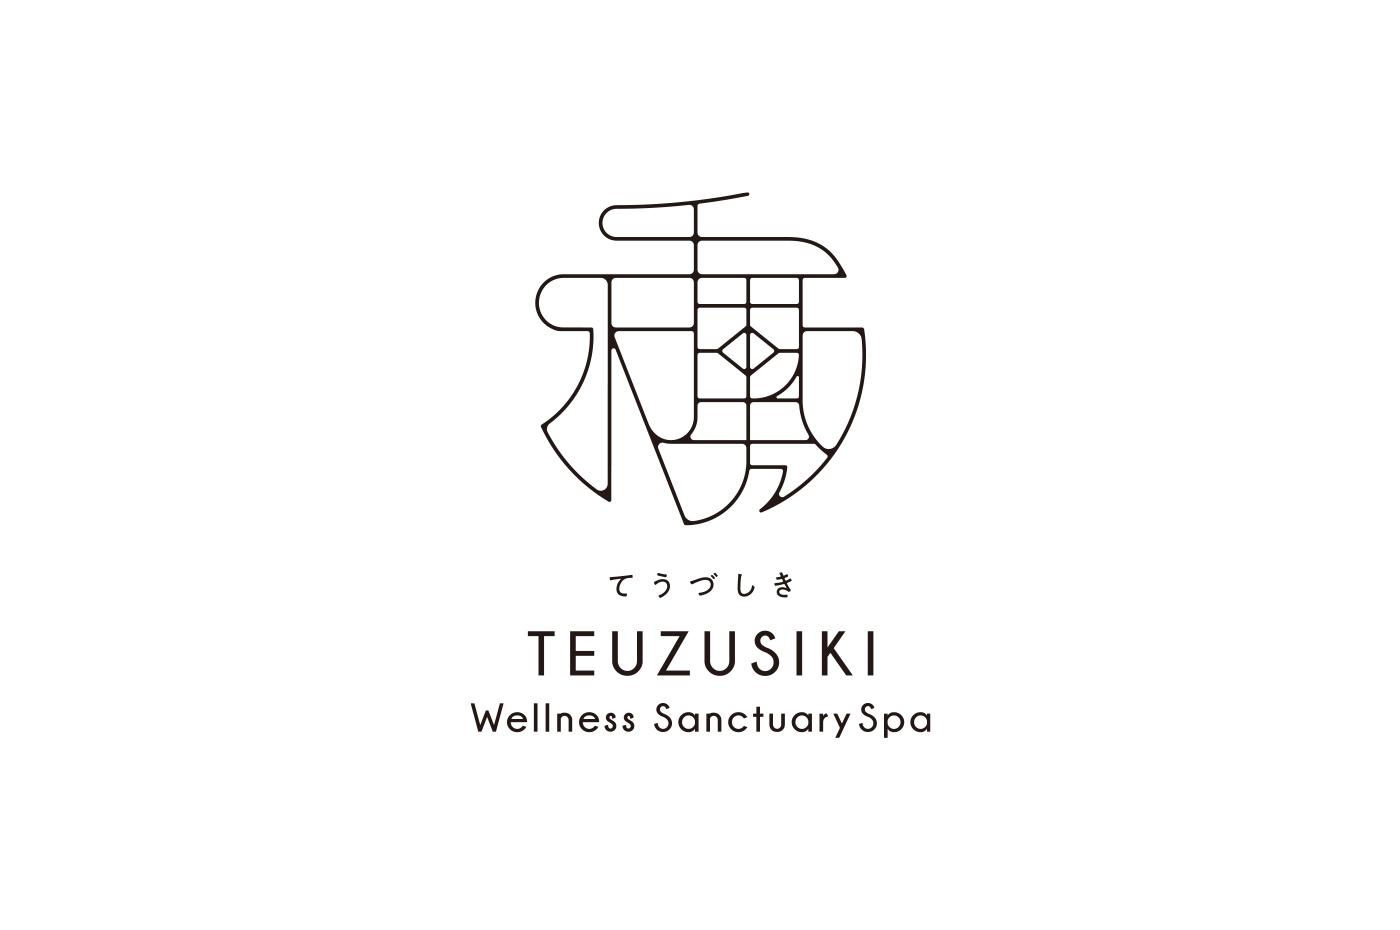 TEUZUSIKI Wellness Sanctuary Spa